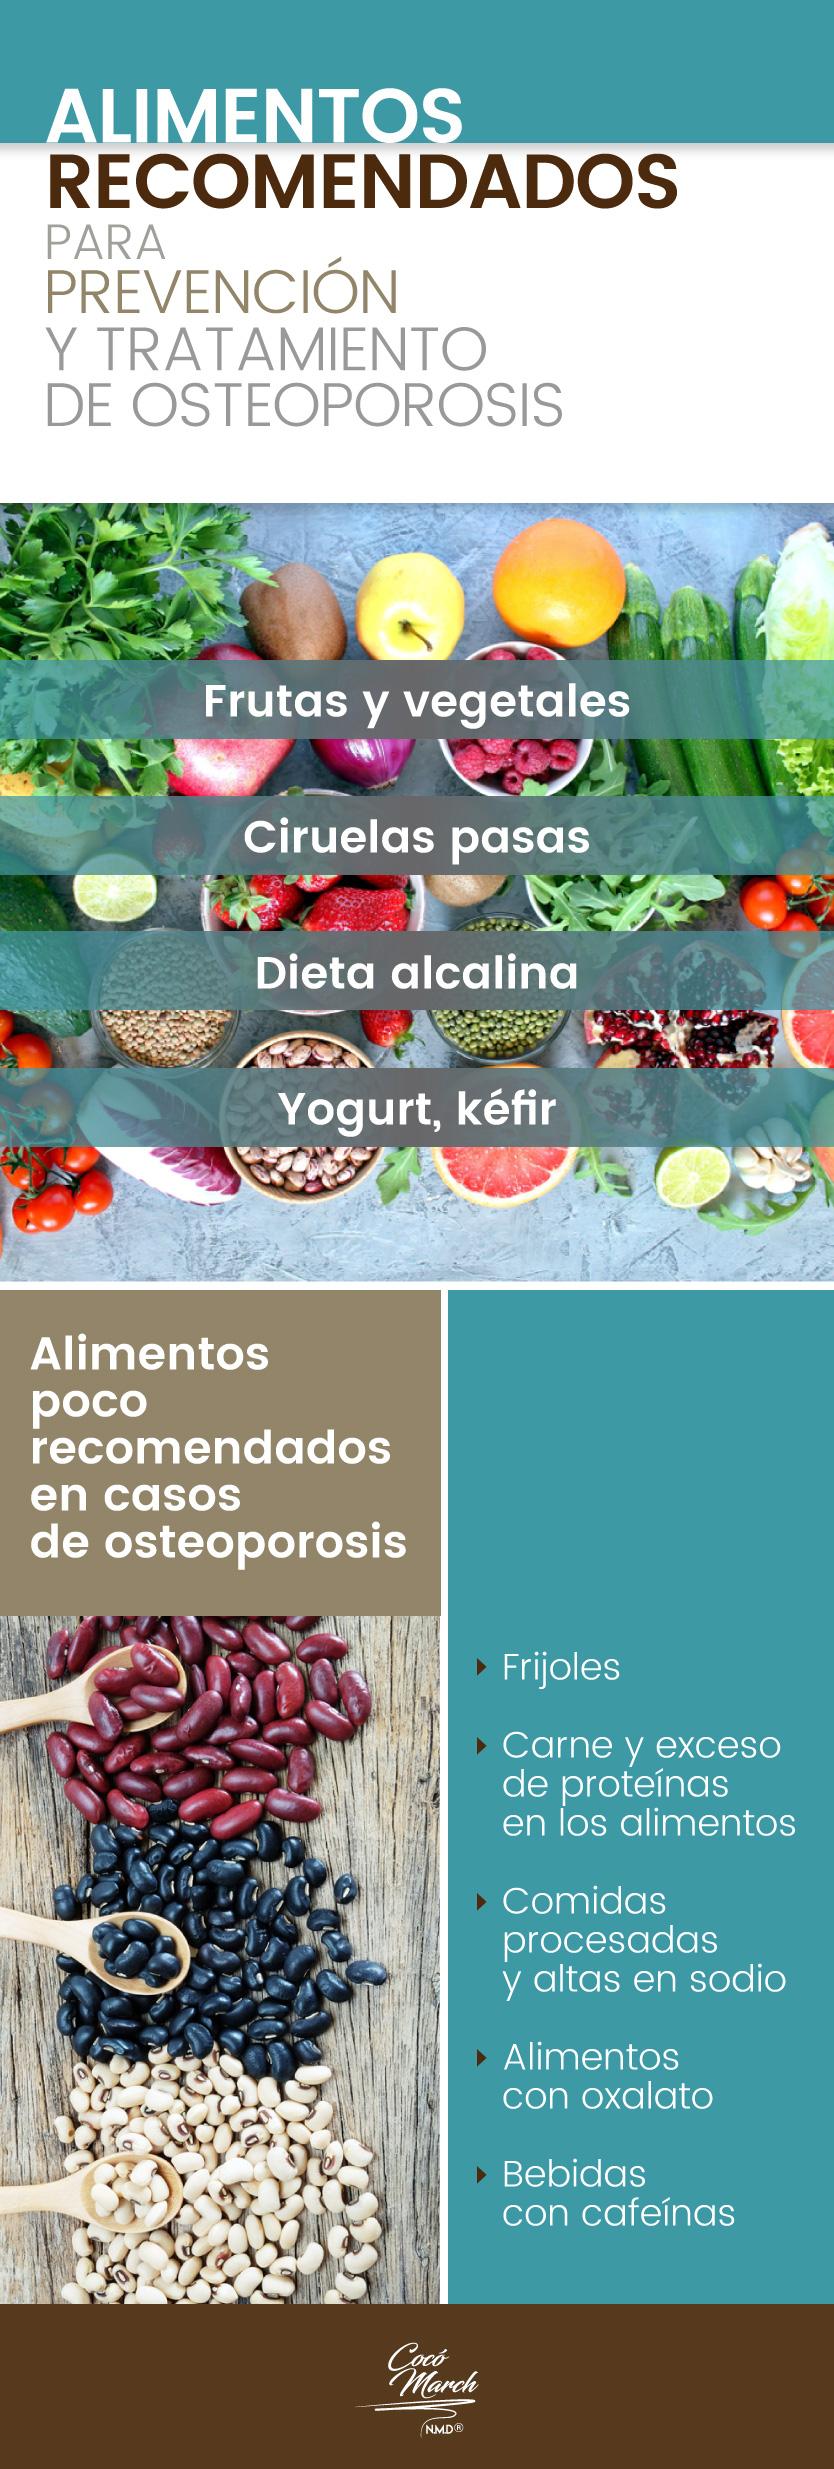 osteoporosis-alimentos-recomendados